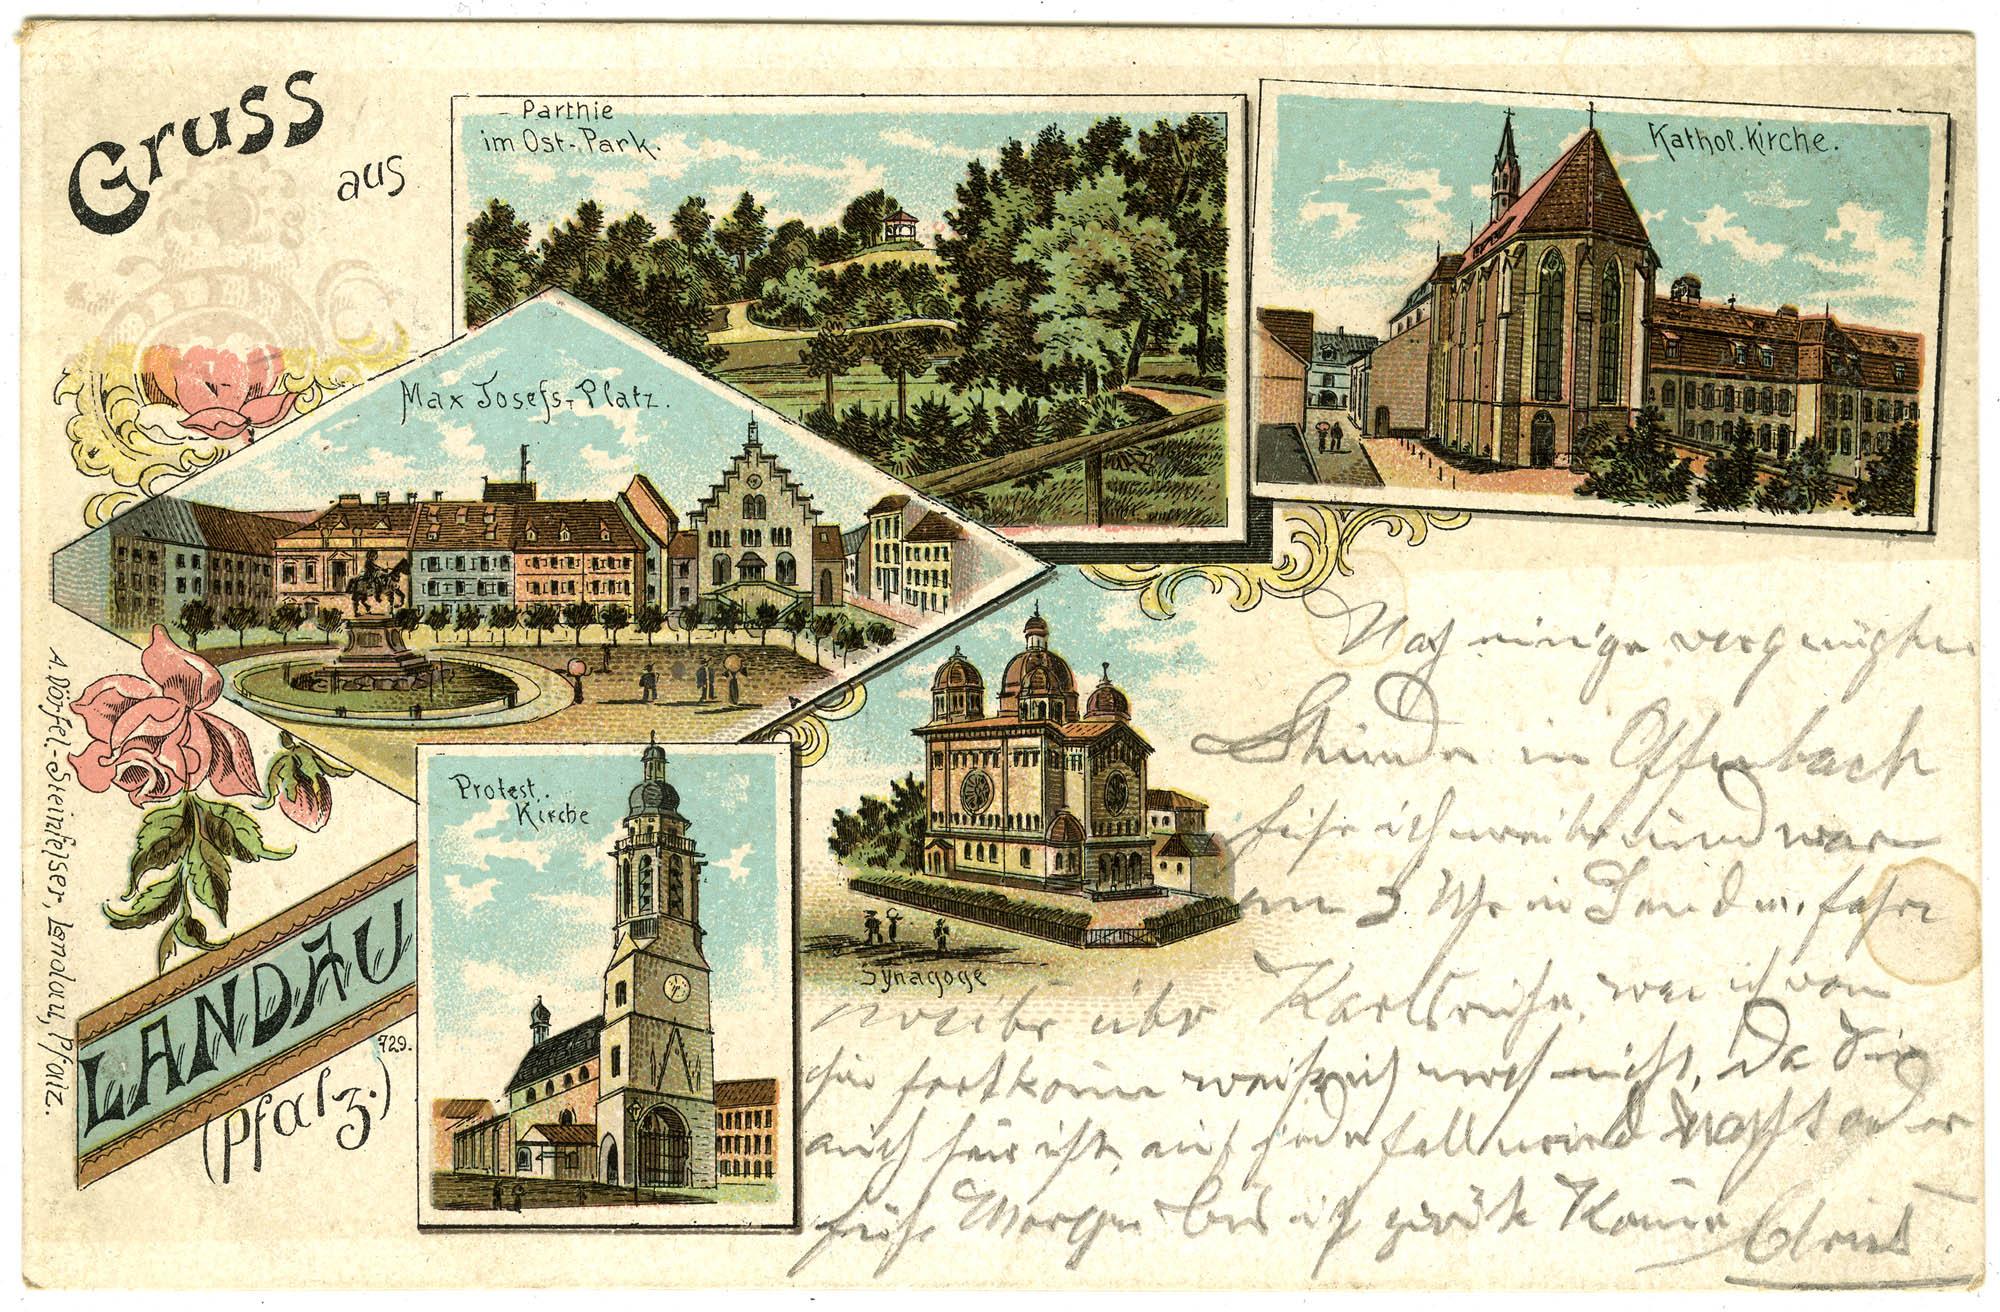 Gruss aus Landau (Pfalz). Parthie im Ost. Park. Kathol. Kirche. Max Josefs-Platz. Protest. Kirche. Synagoge.